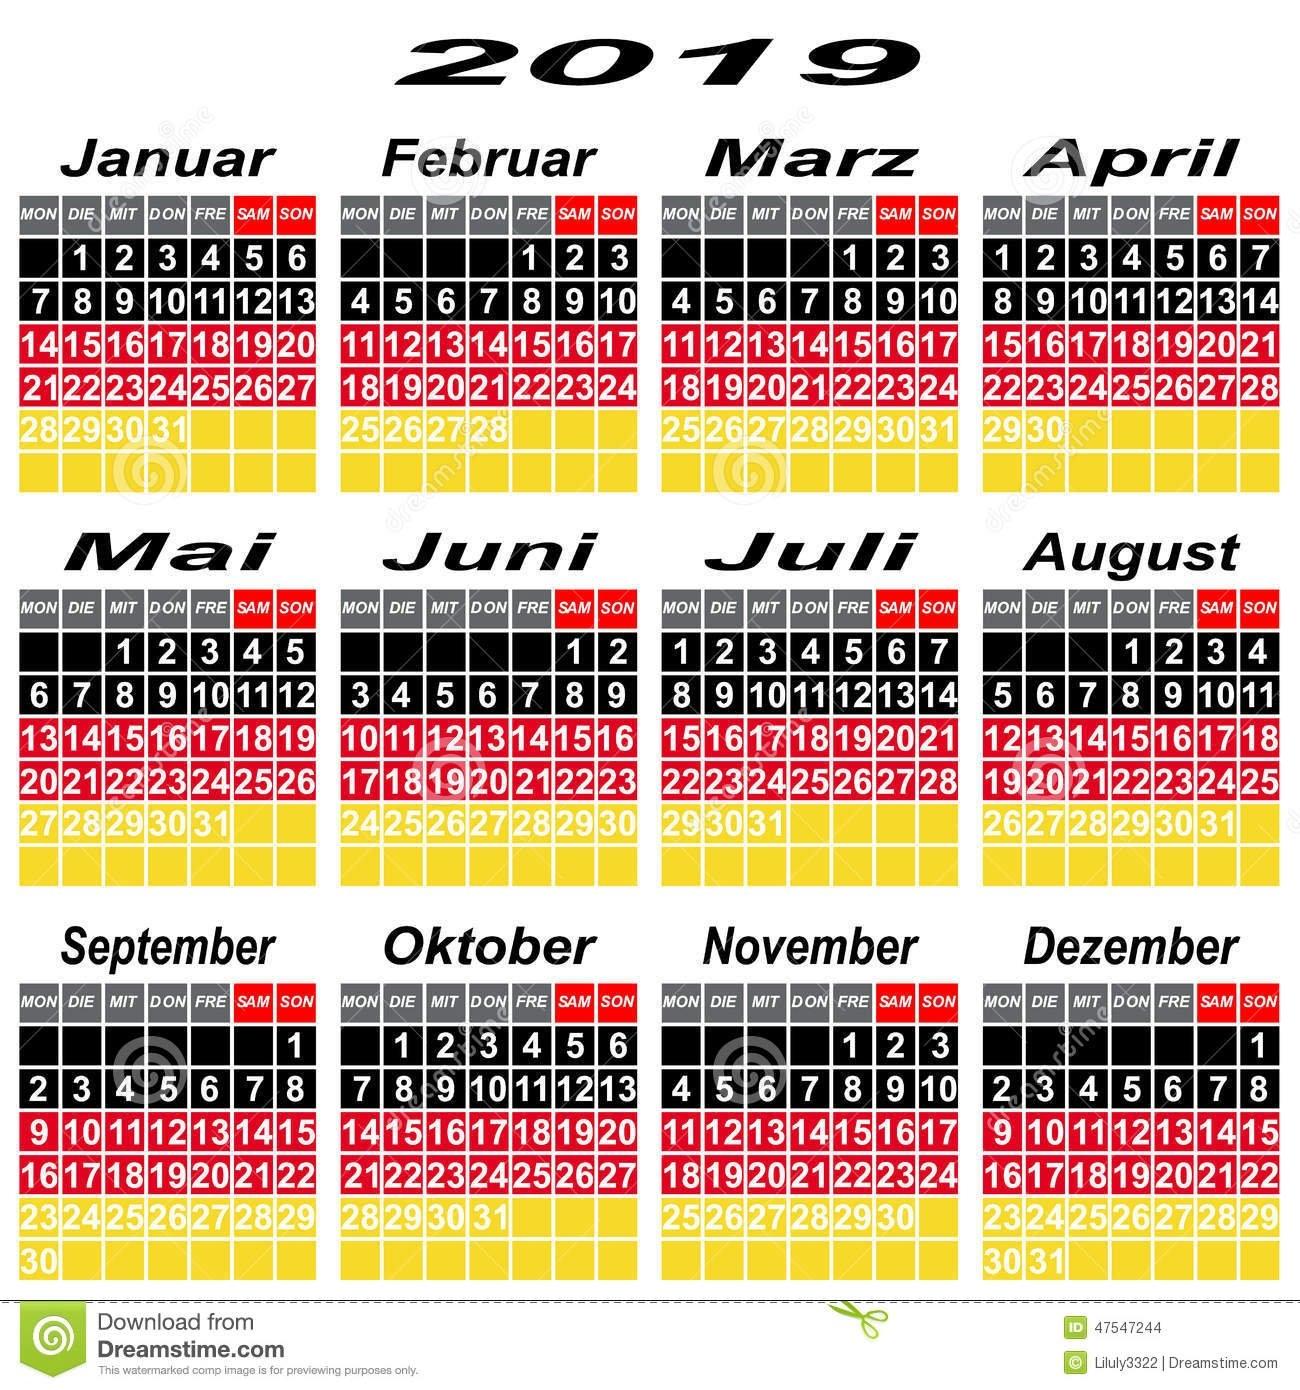 Germany Calendar Of 2019. Stock Vector. Illustration Of Countdown Calendar 2019 Germany